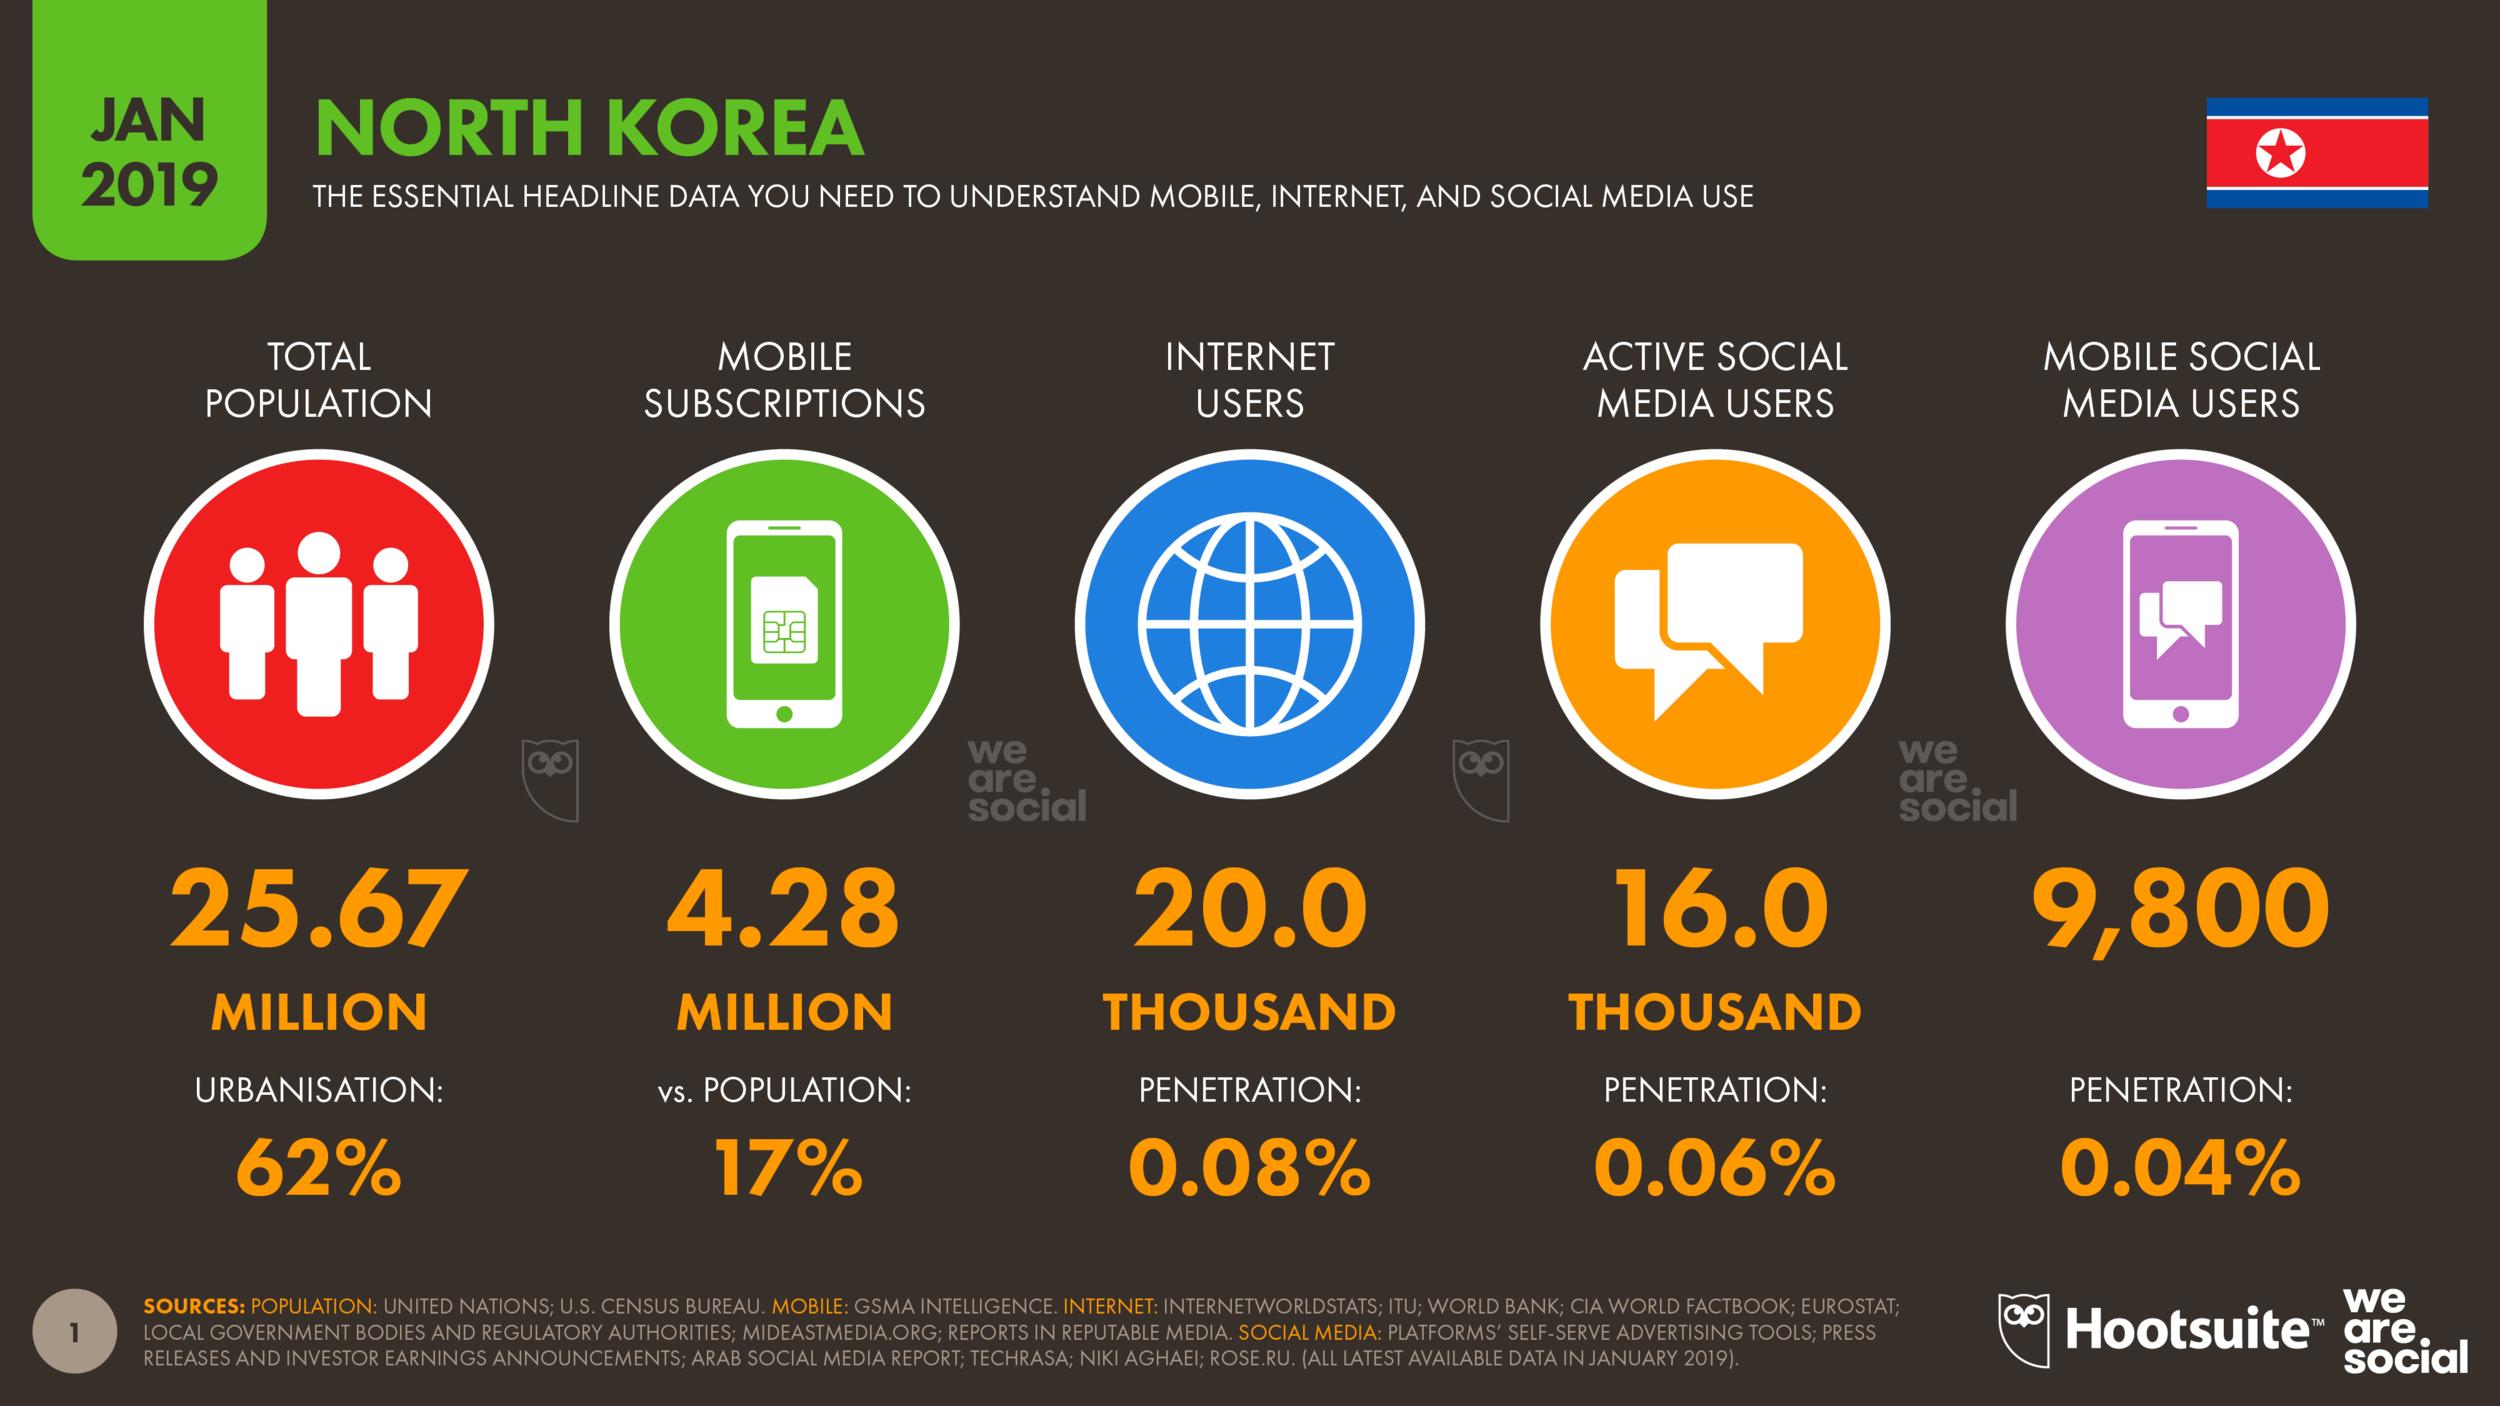 Digital 2019 North Korea January 2019 DataReportal